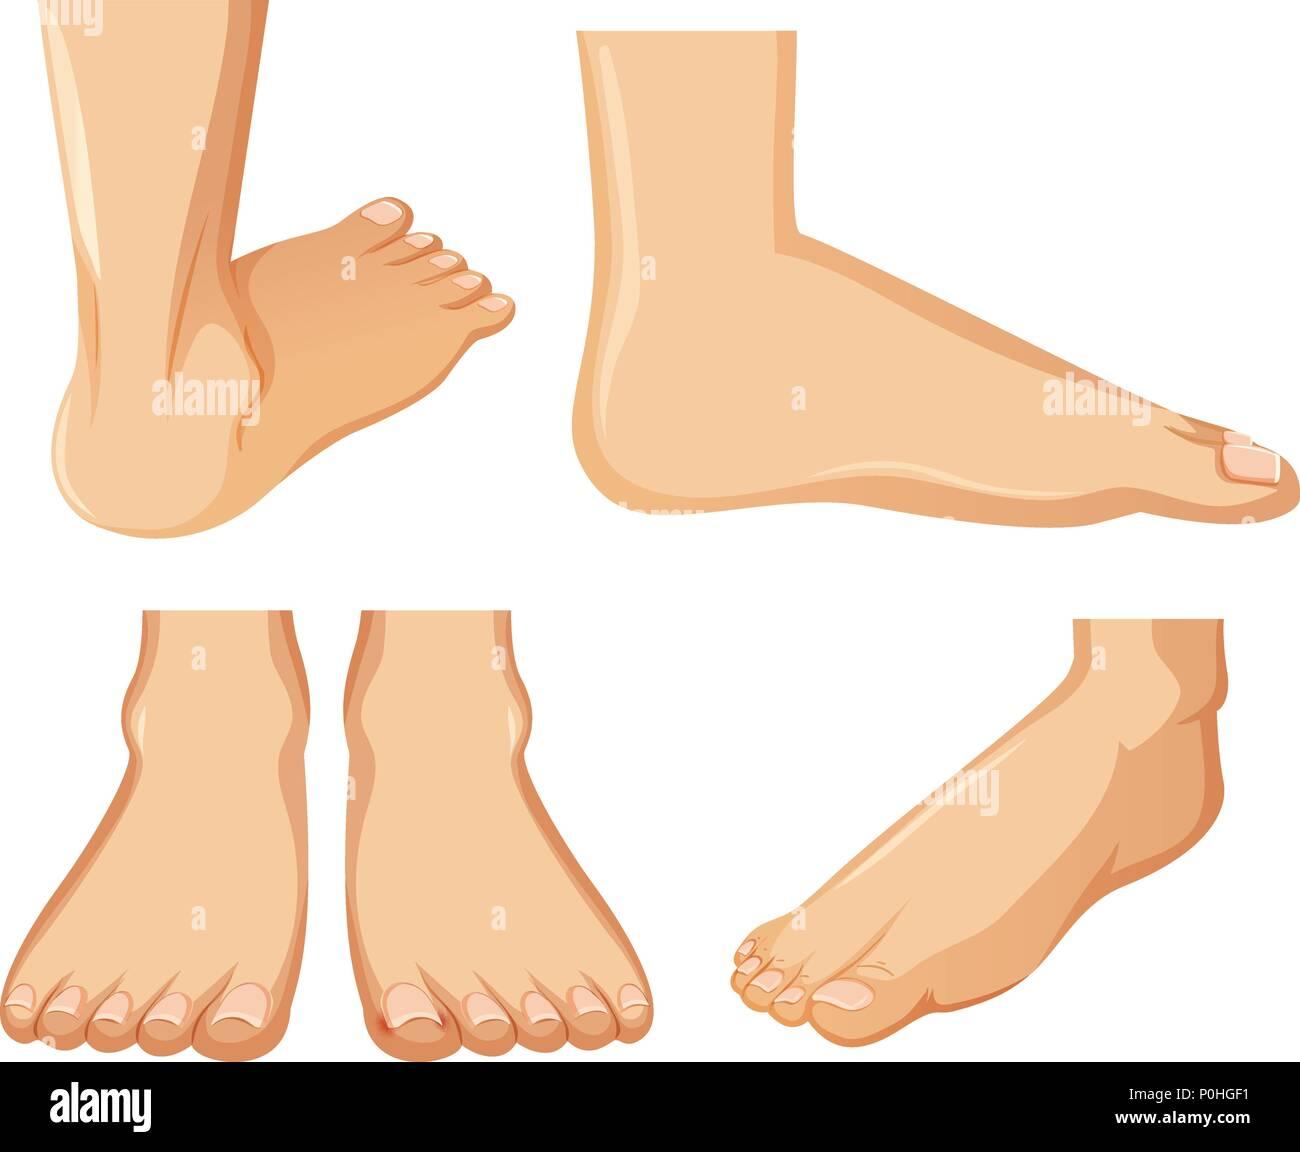 Human Foot Anatomy Stock Photos Human Foot Anatomy Stock Images